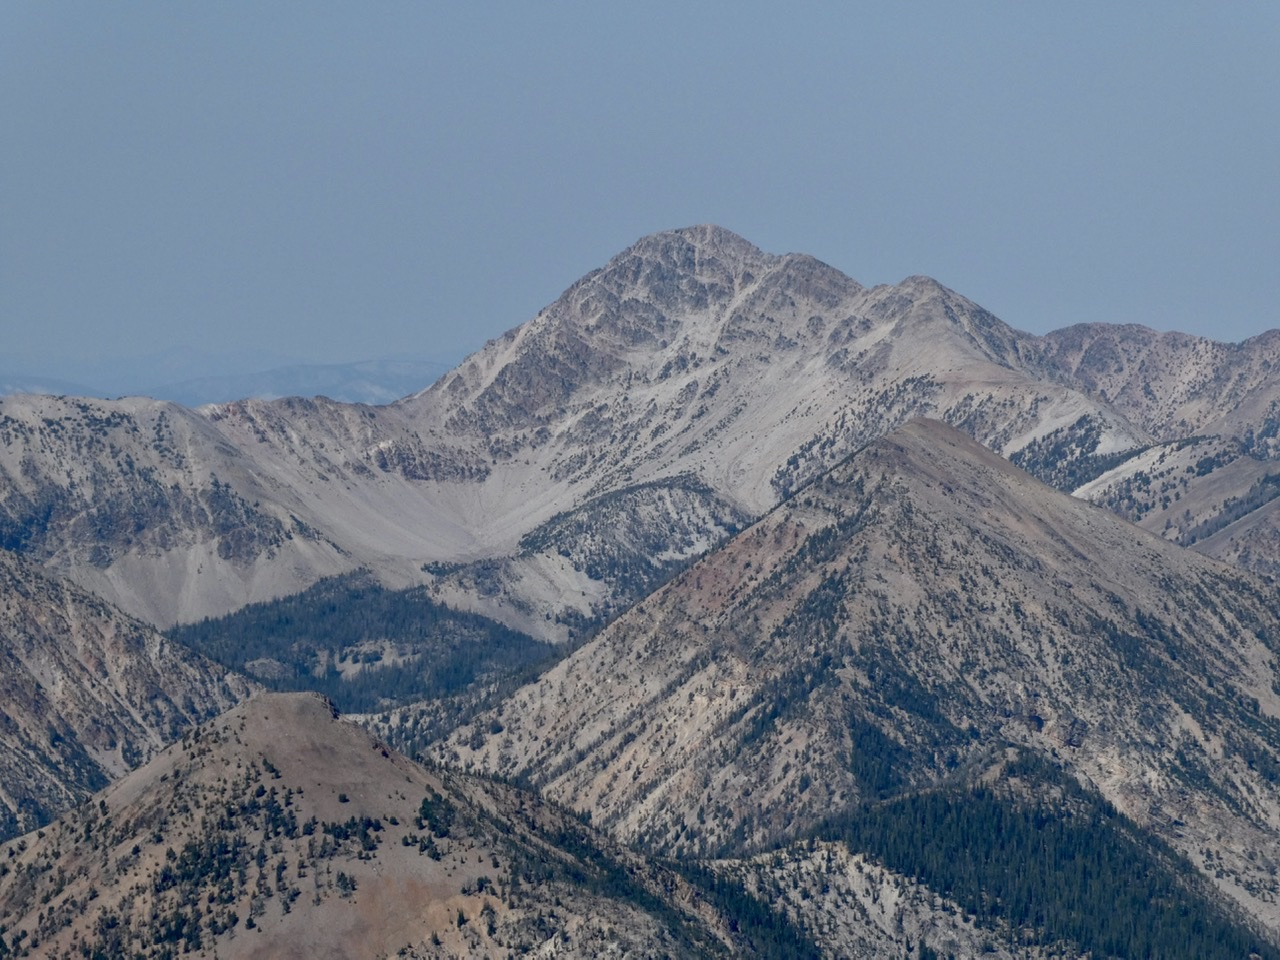 May Mountain viewed from Buffalo Skull Peak.